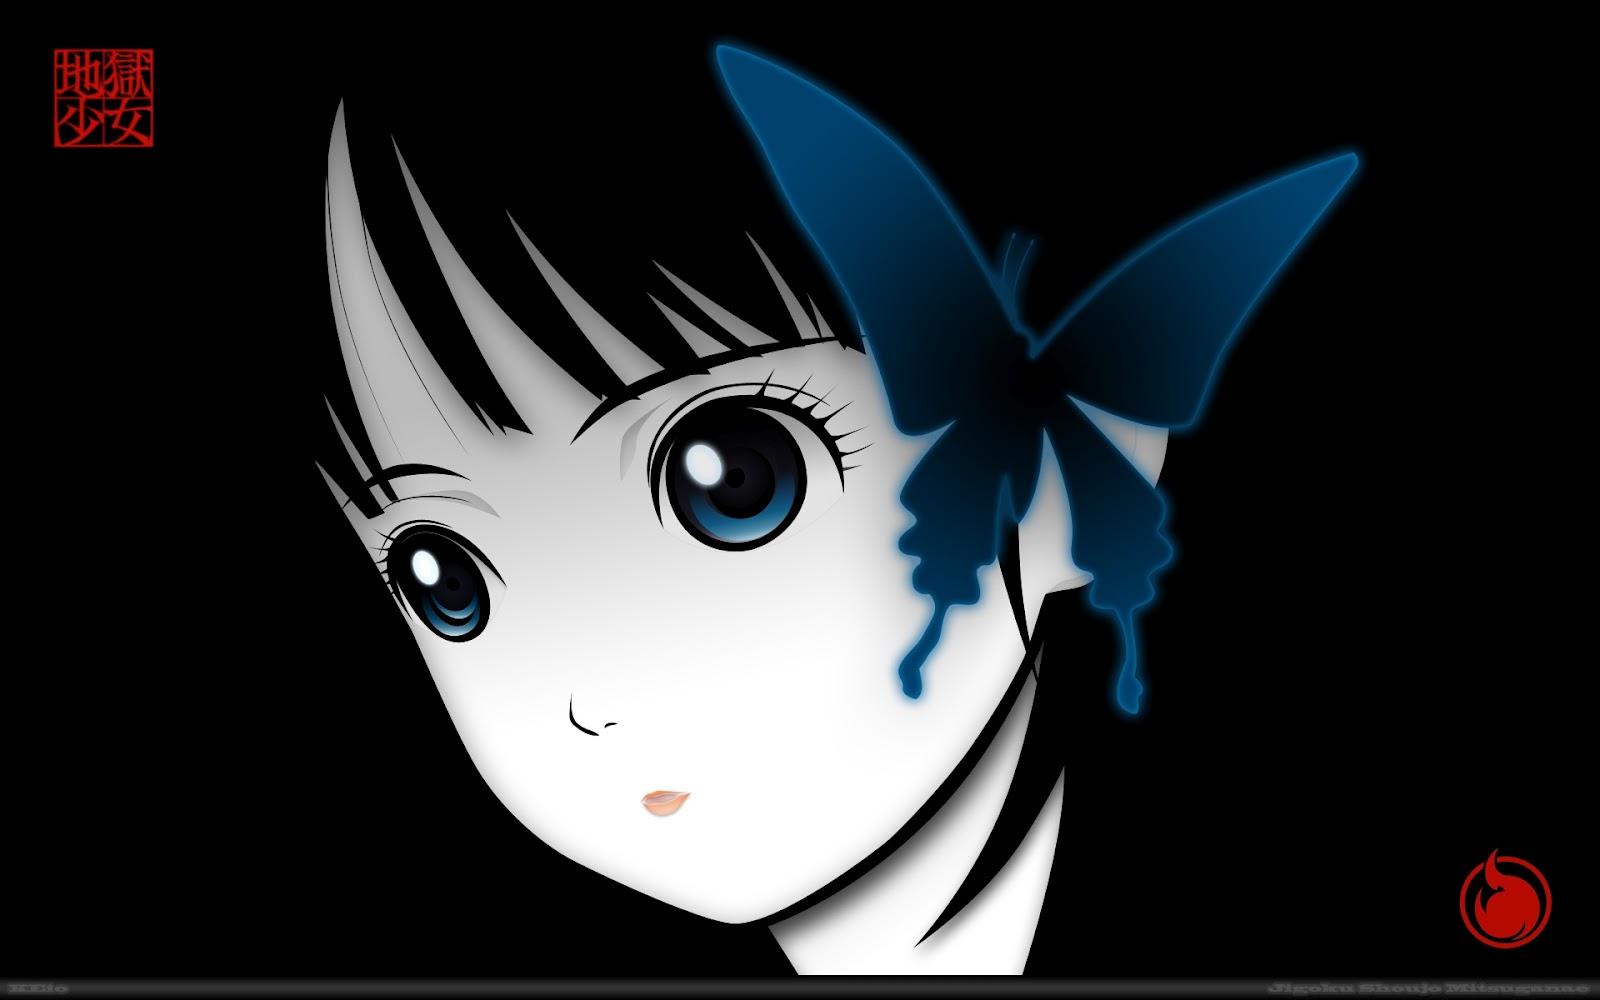 Free Download Labels Anime Wallpapers Desktop Wallpapers